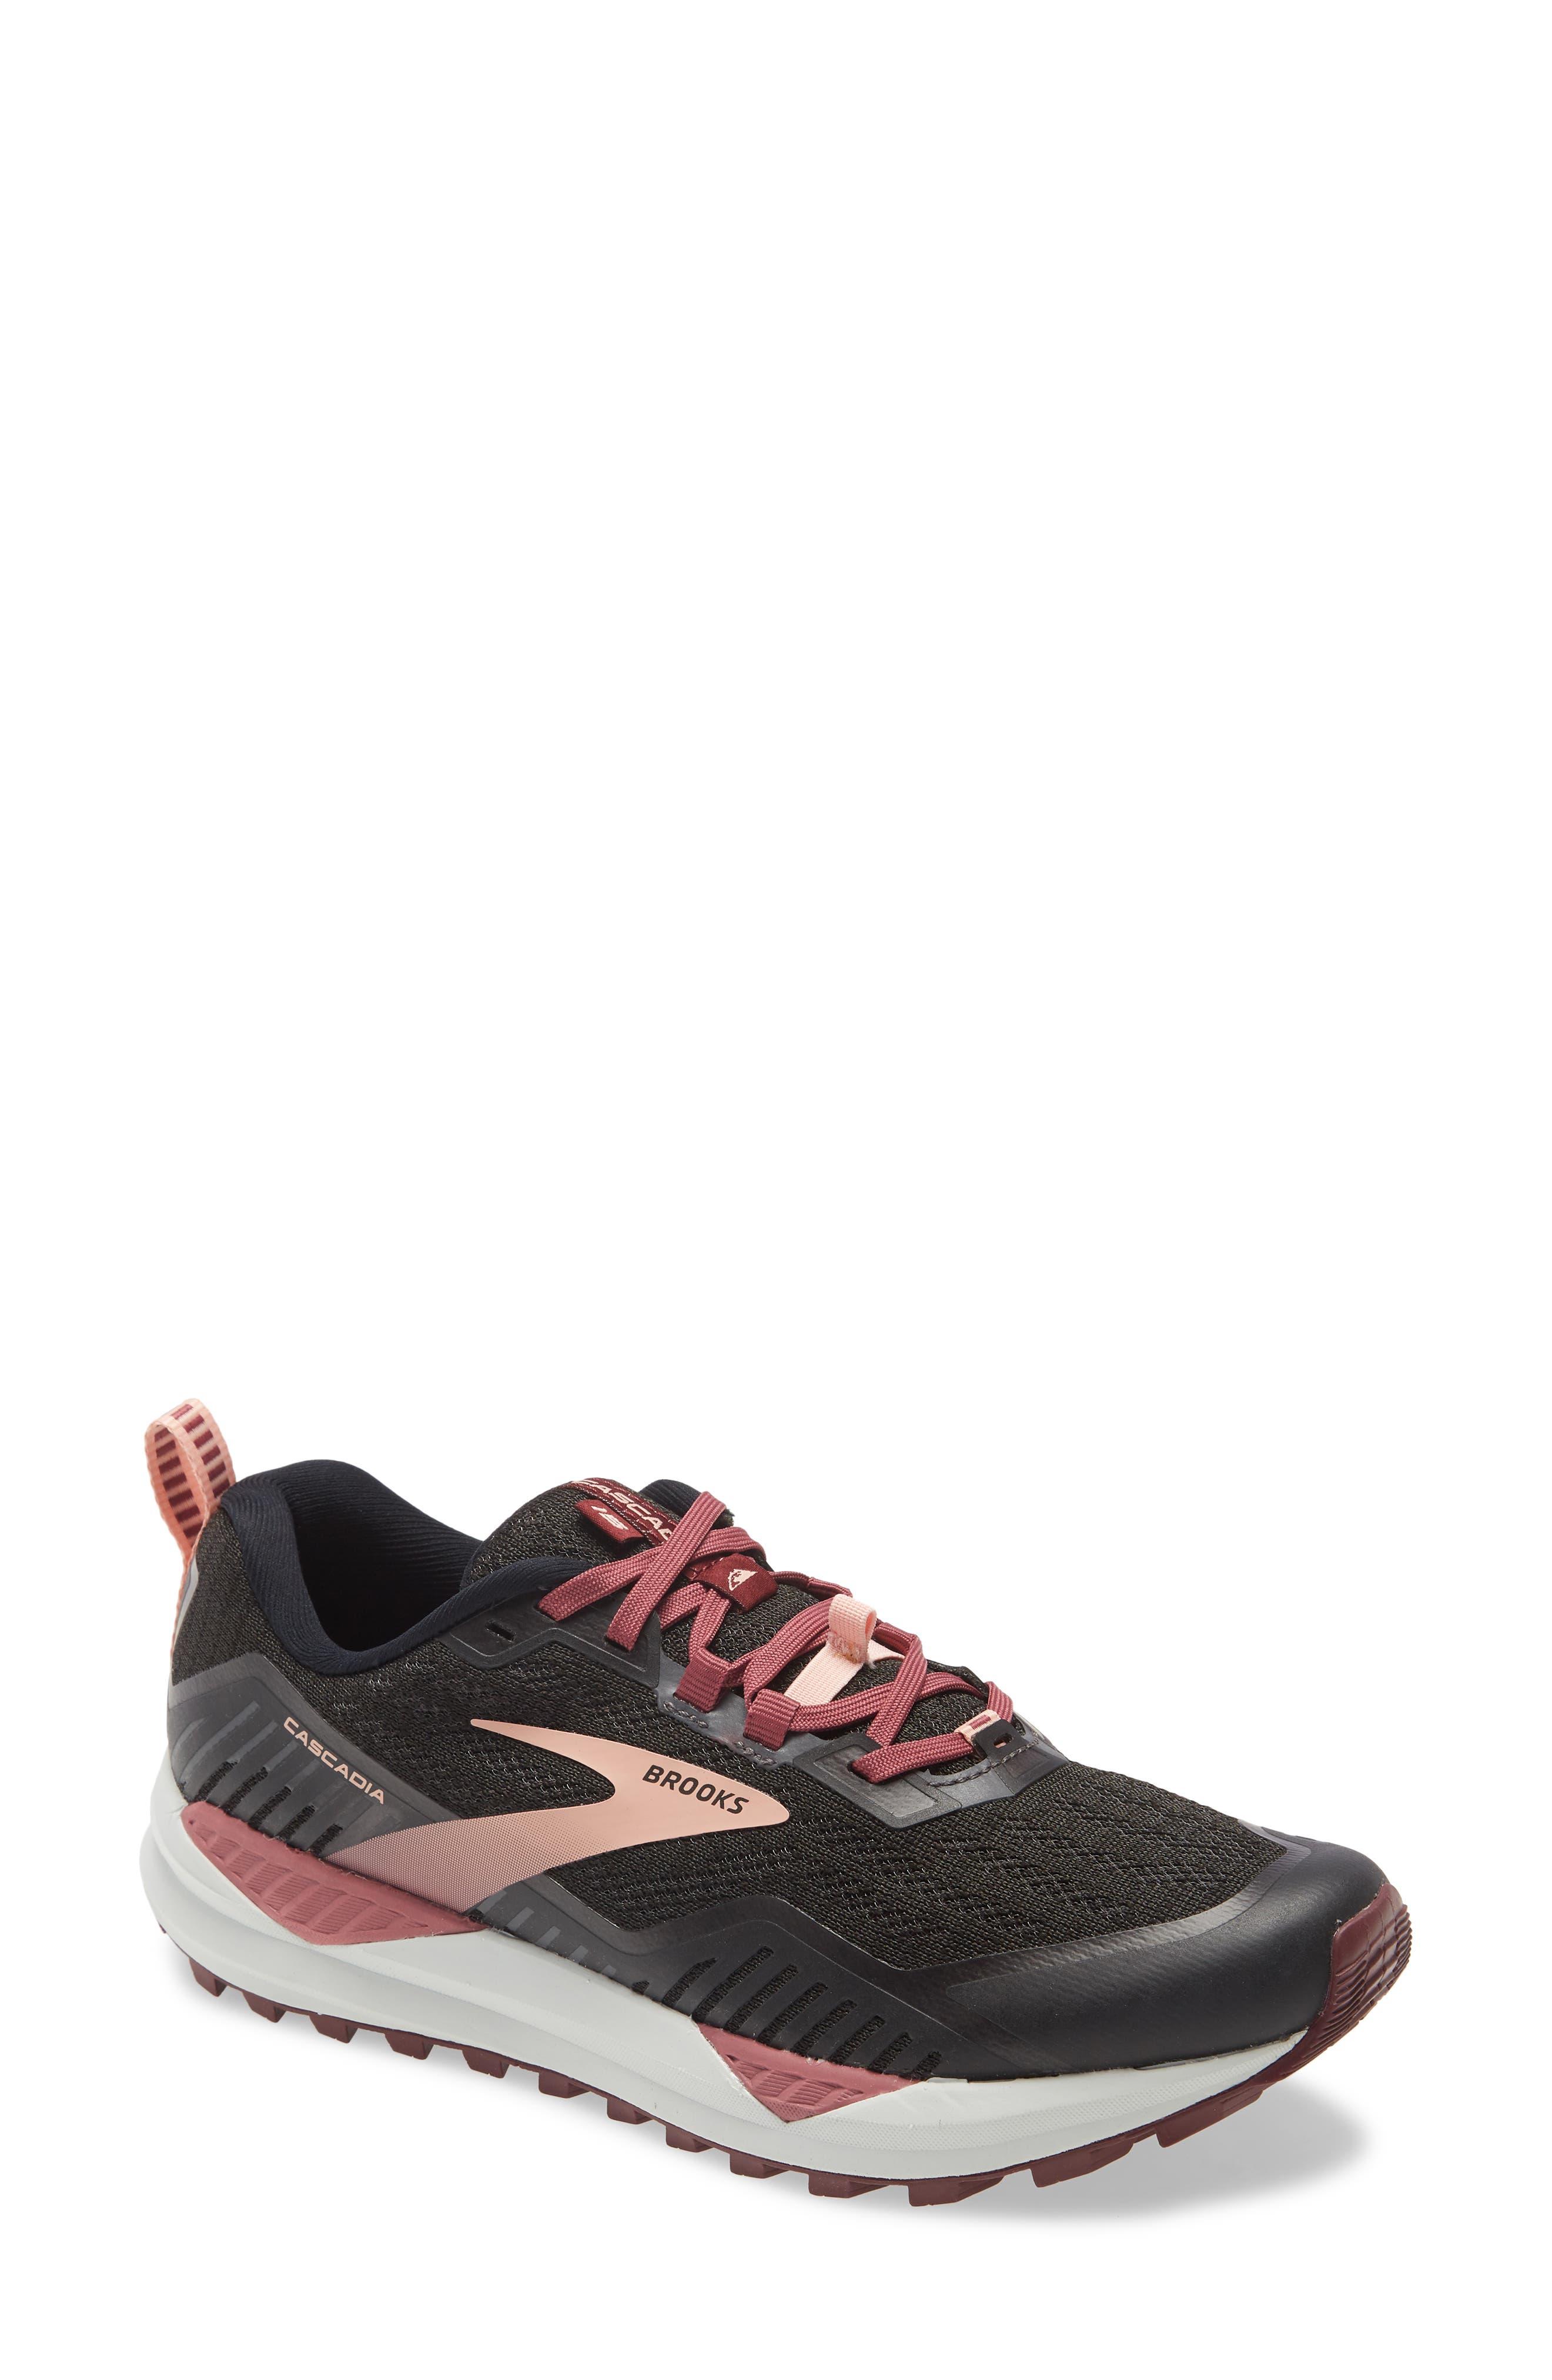 Cascadia 15 Trail Running Shoe